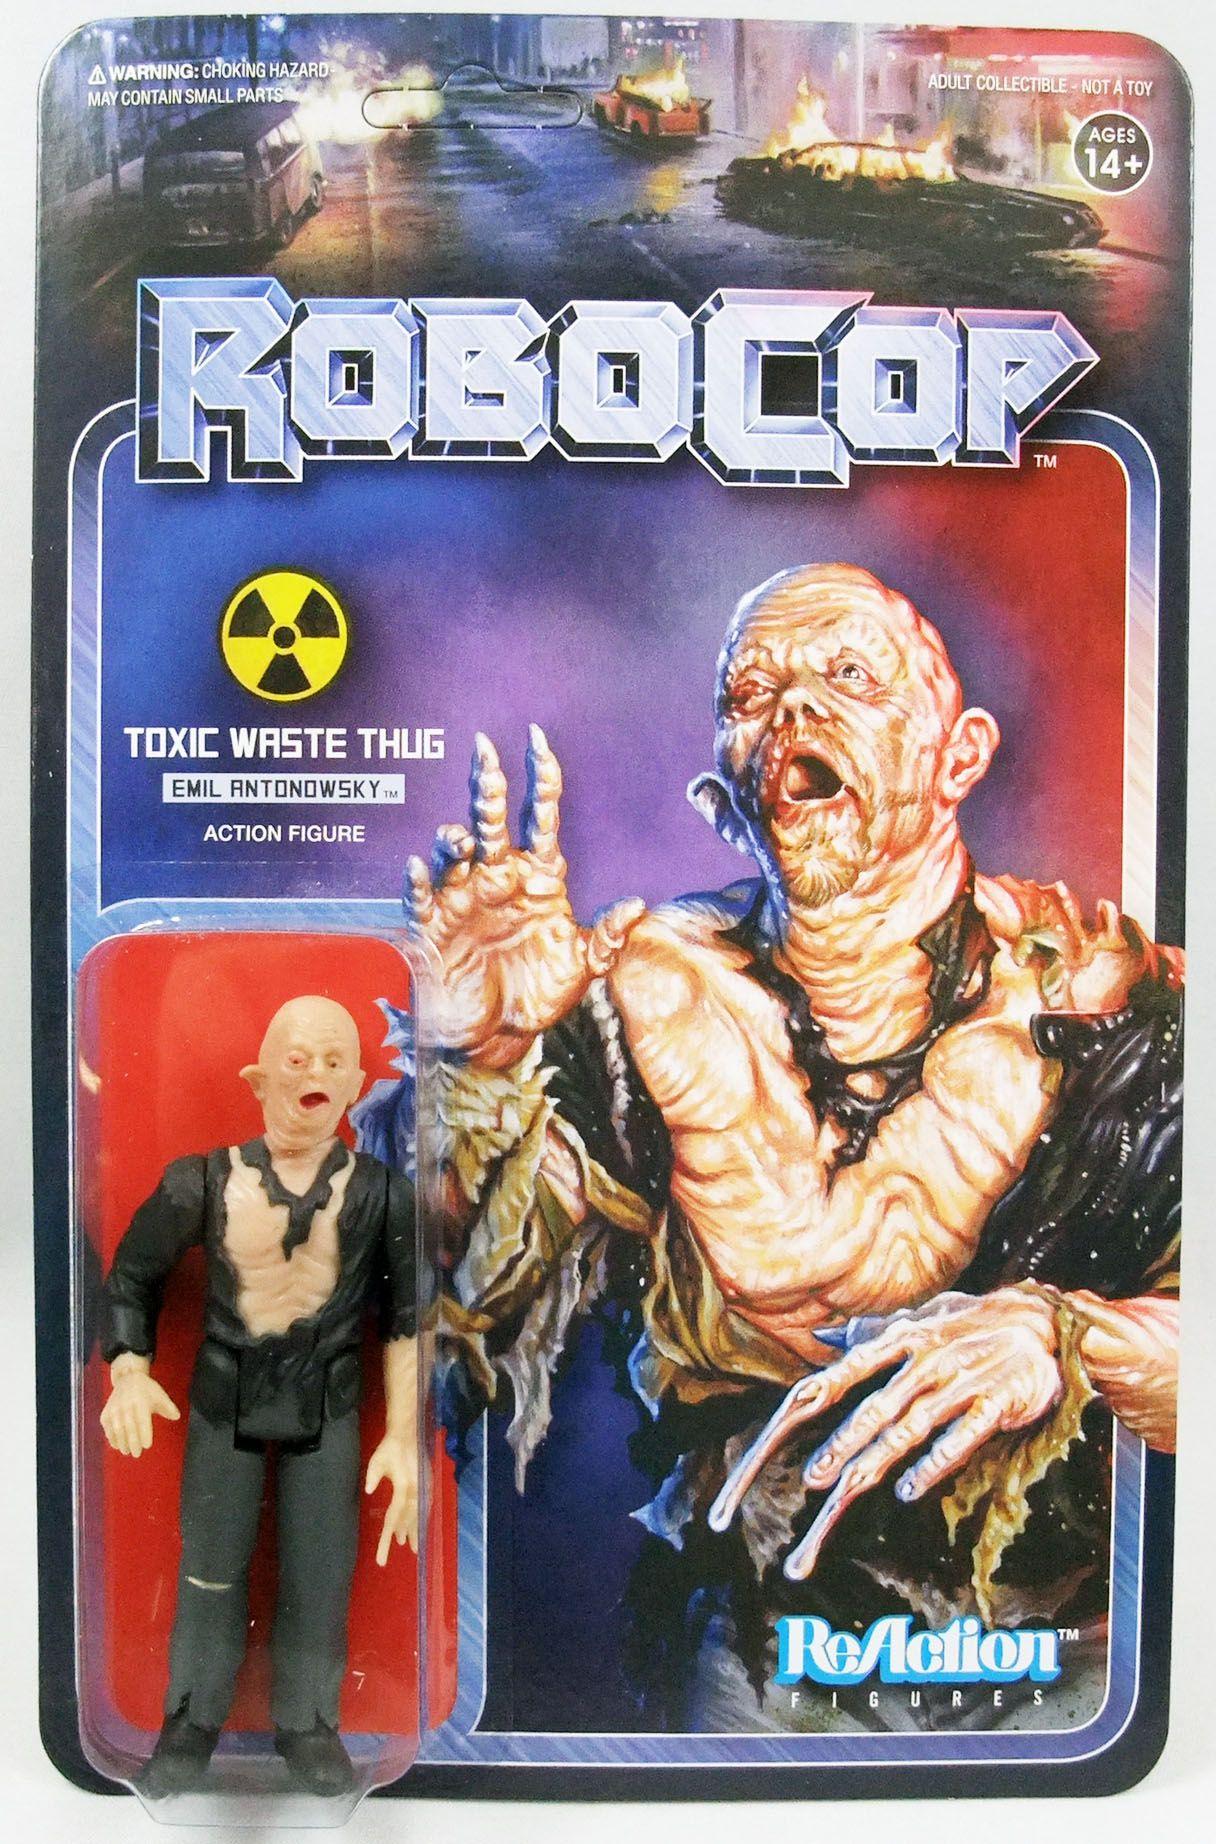 Robocop - Super7 ReAction Figure - Toxic Waste Thung Emil Antonowsky